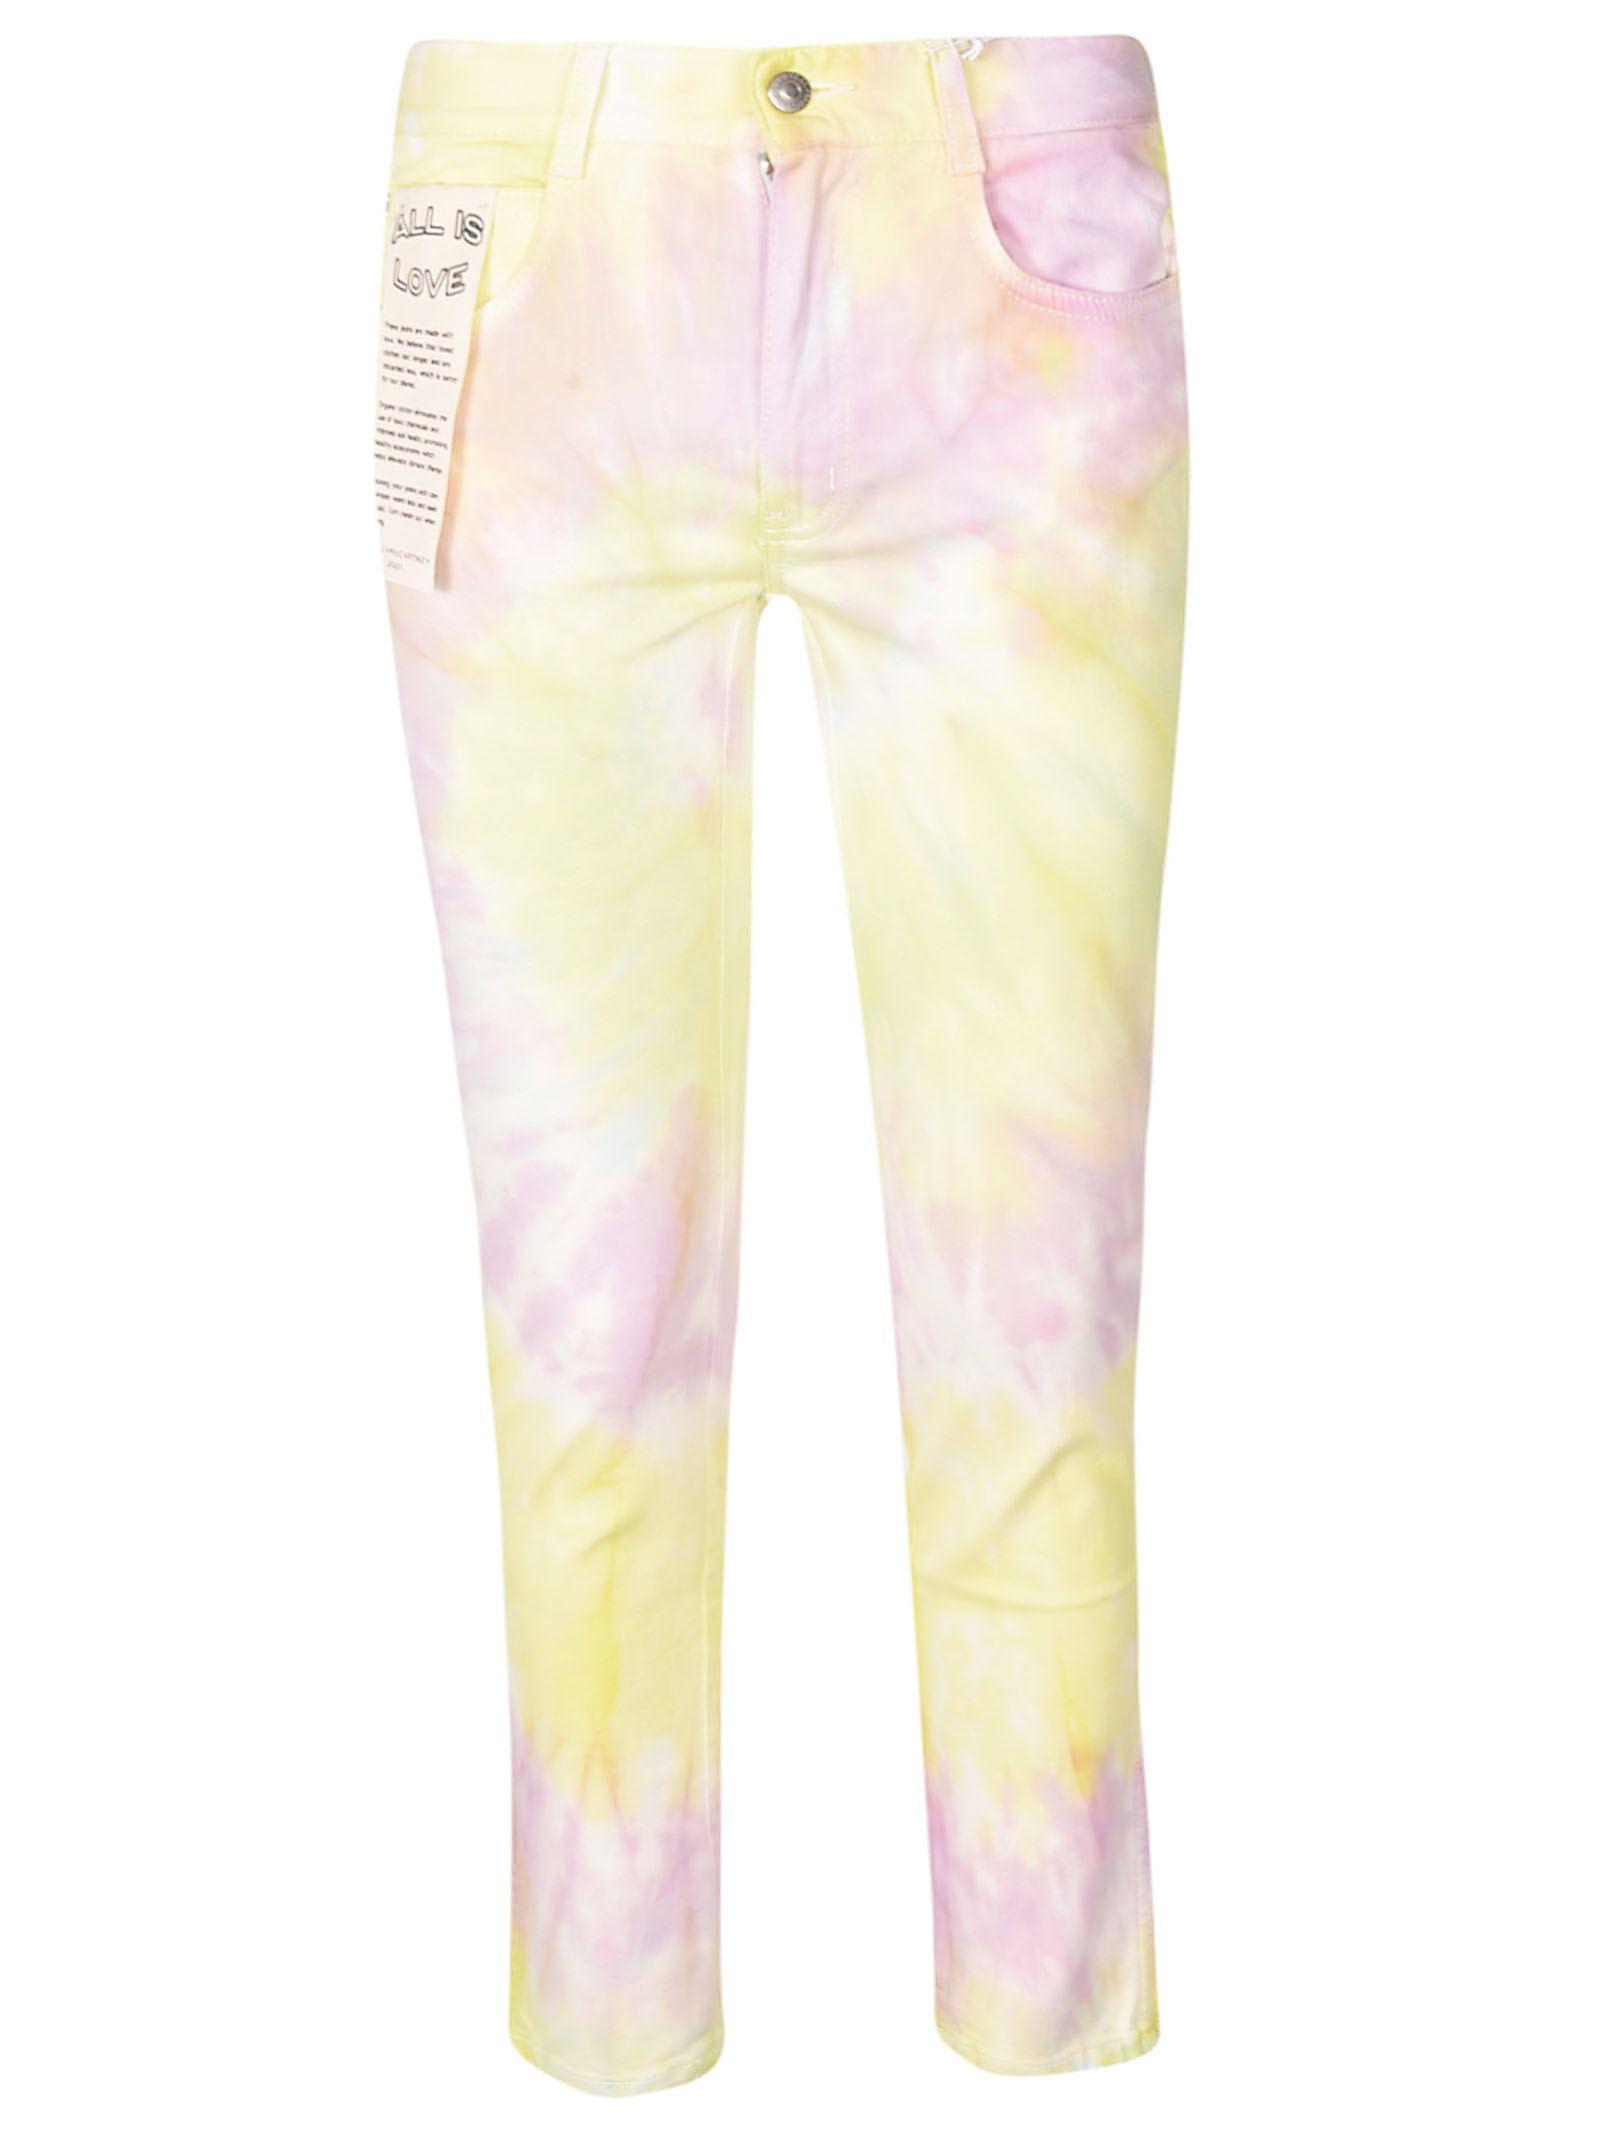 Stella Mccartney Jeans Stella McCartney Tie-dye Print Jeans